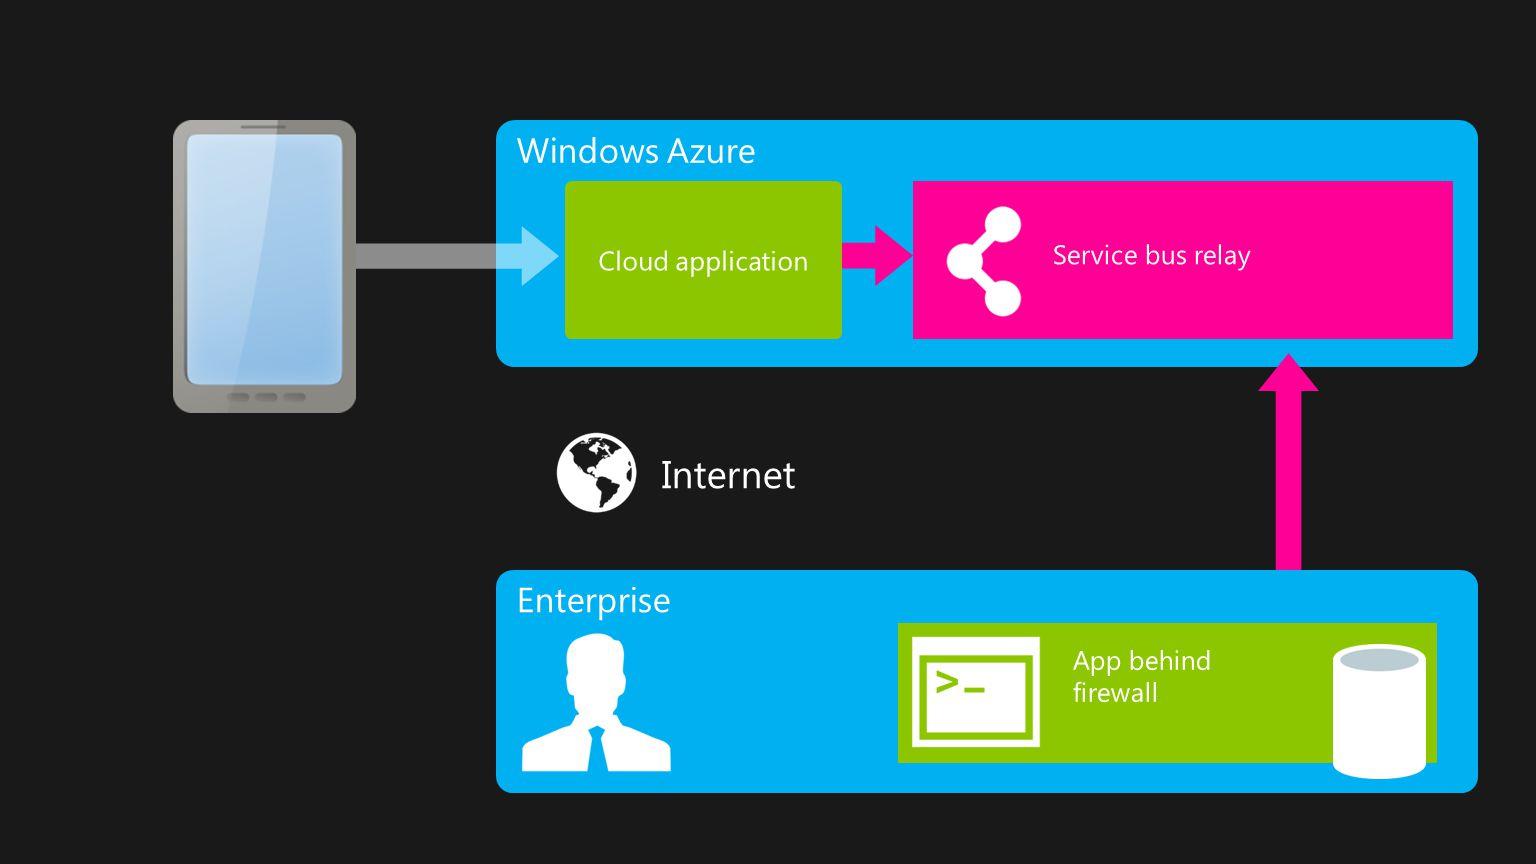 Internet Windows Azure Enterprise Cloud application Service bus relay